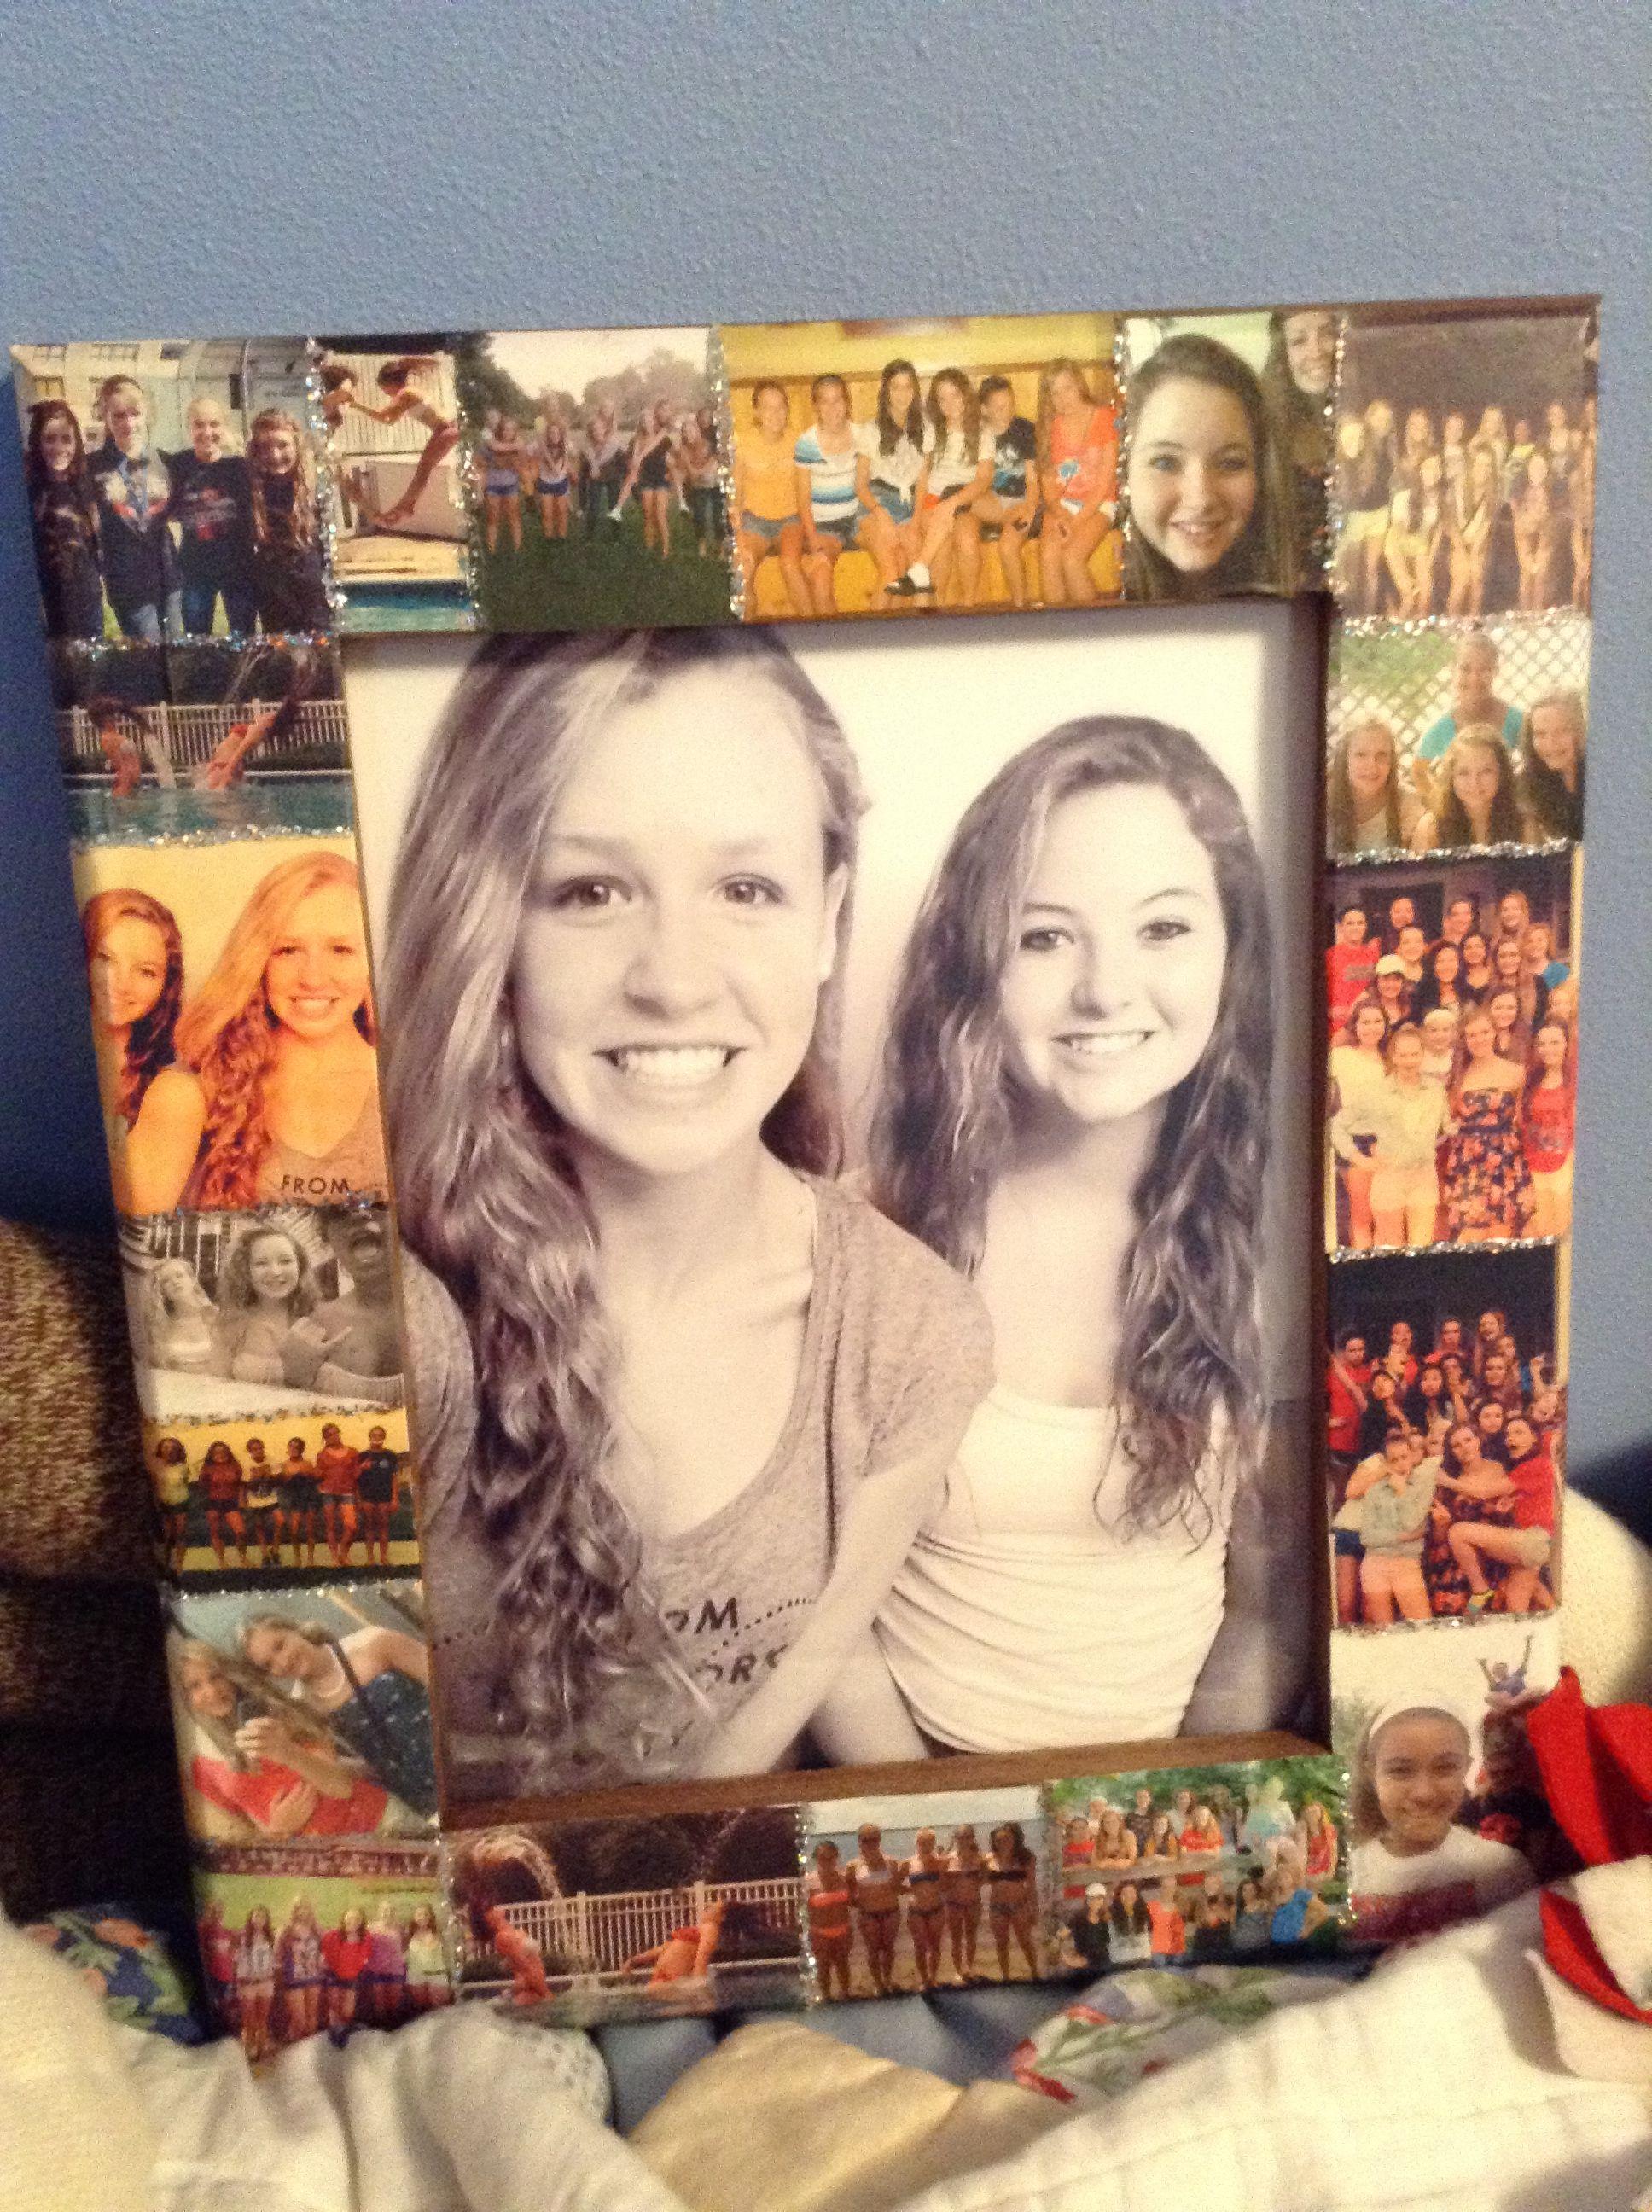 diy photo frame décor ideas | best friends pics | diy gifts, 16